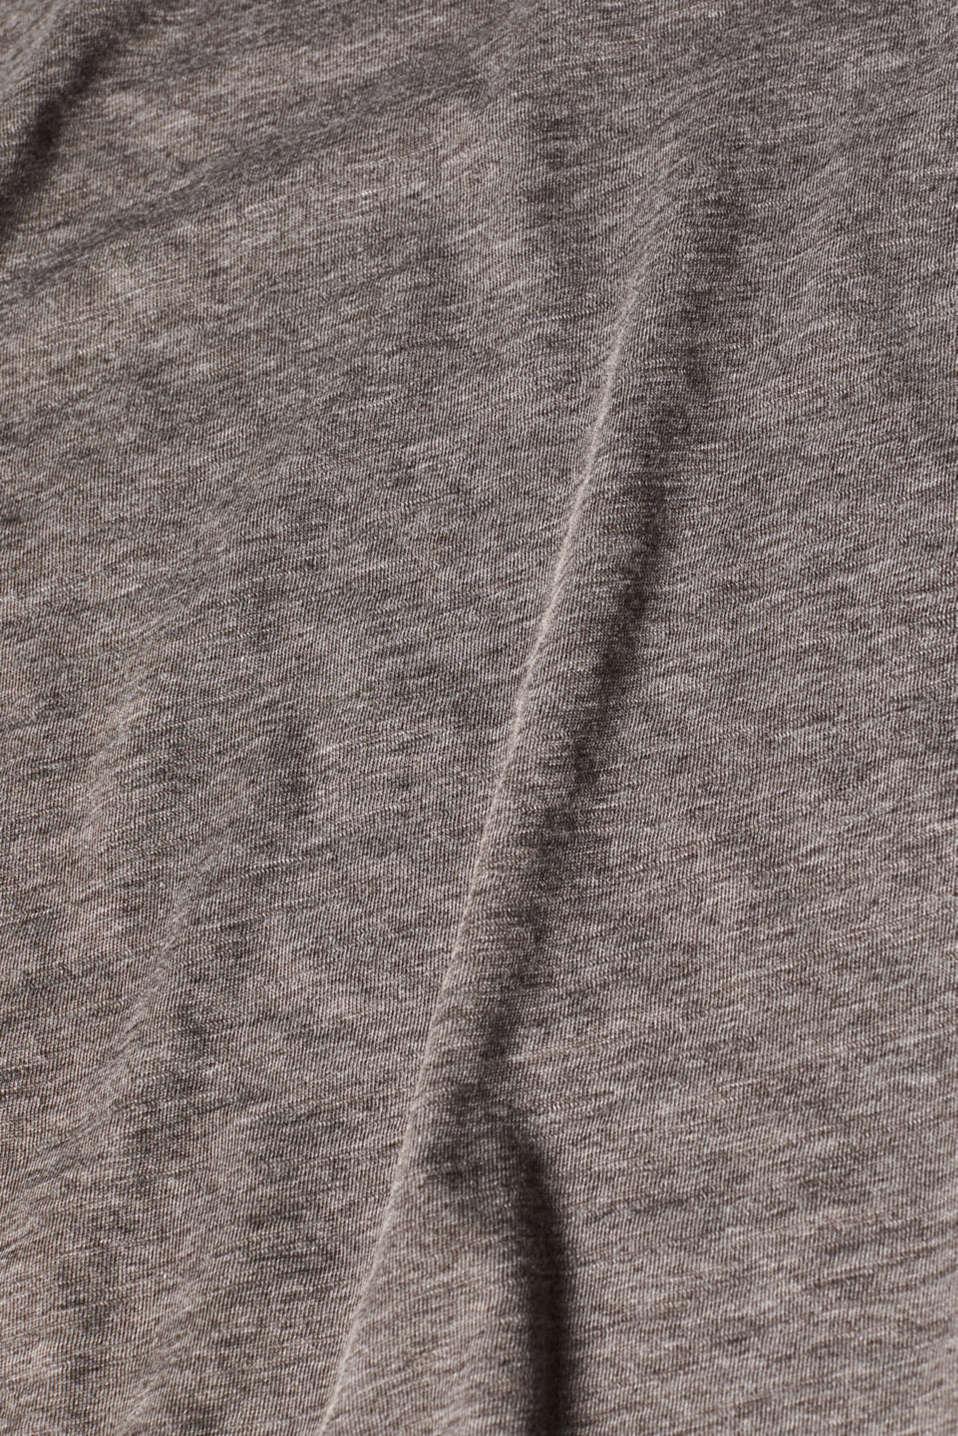 Long sleeve slub top with organic cotton, DARK GREY 4, detail image number 4